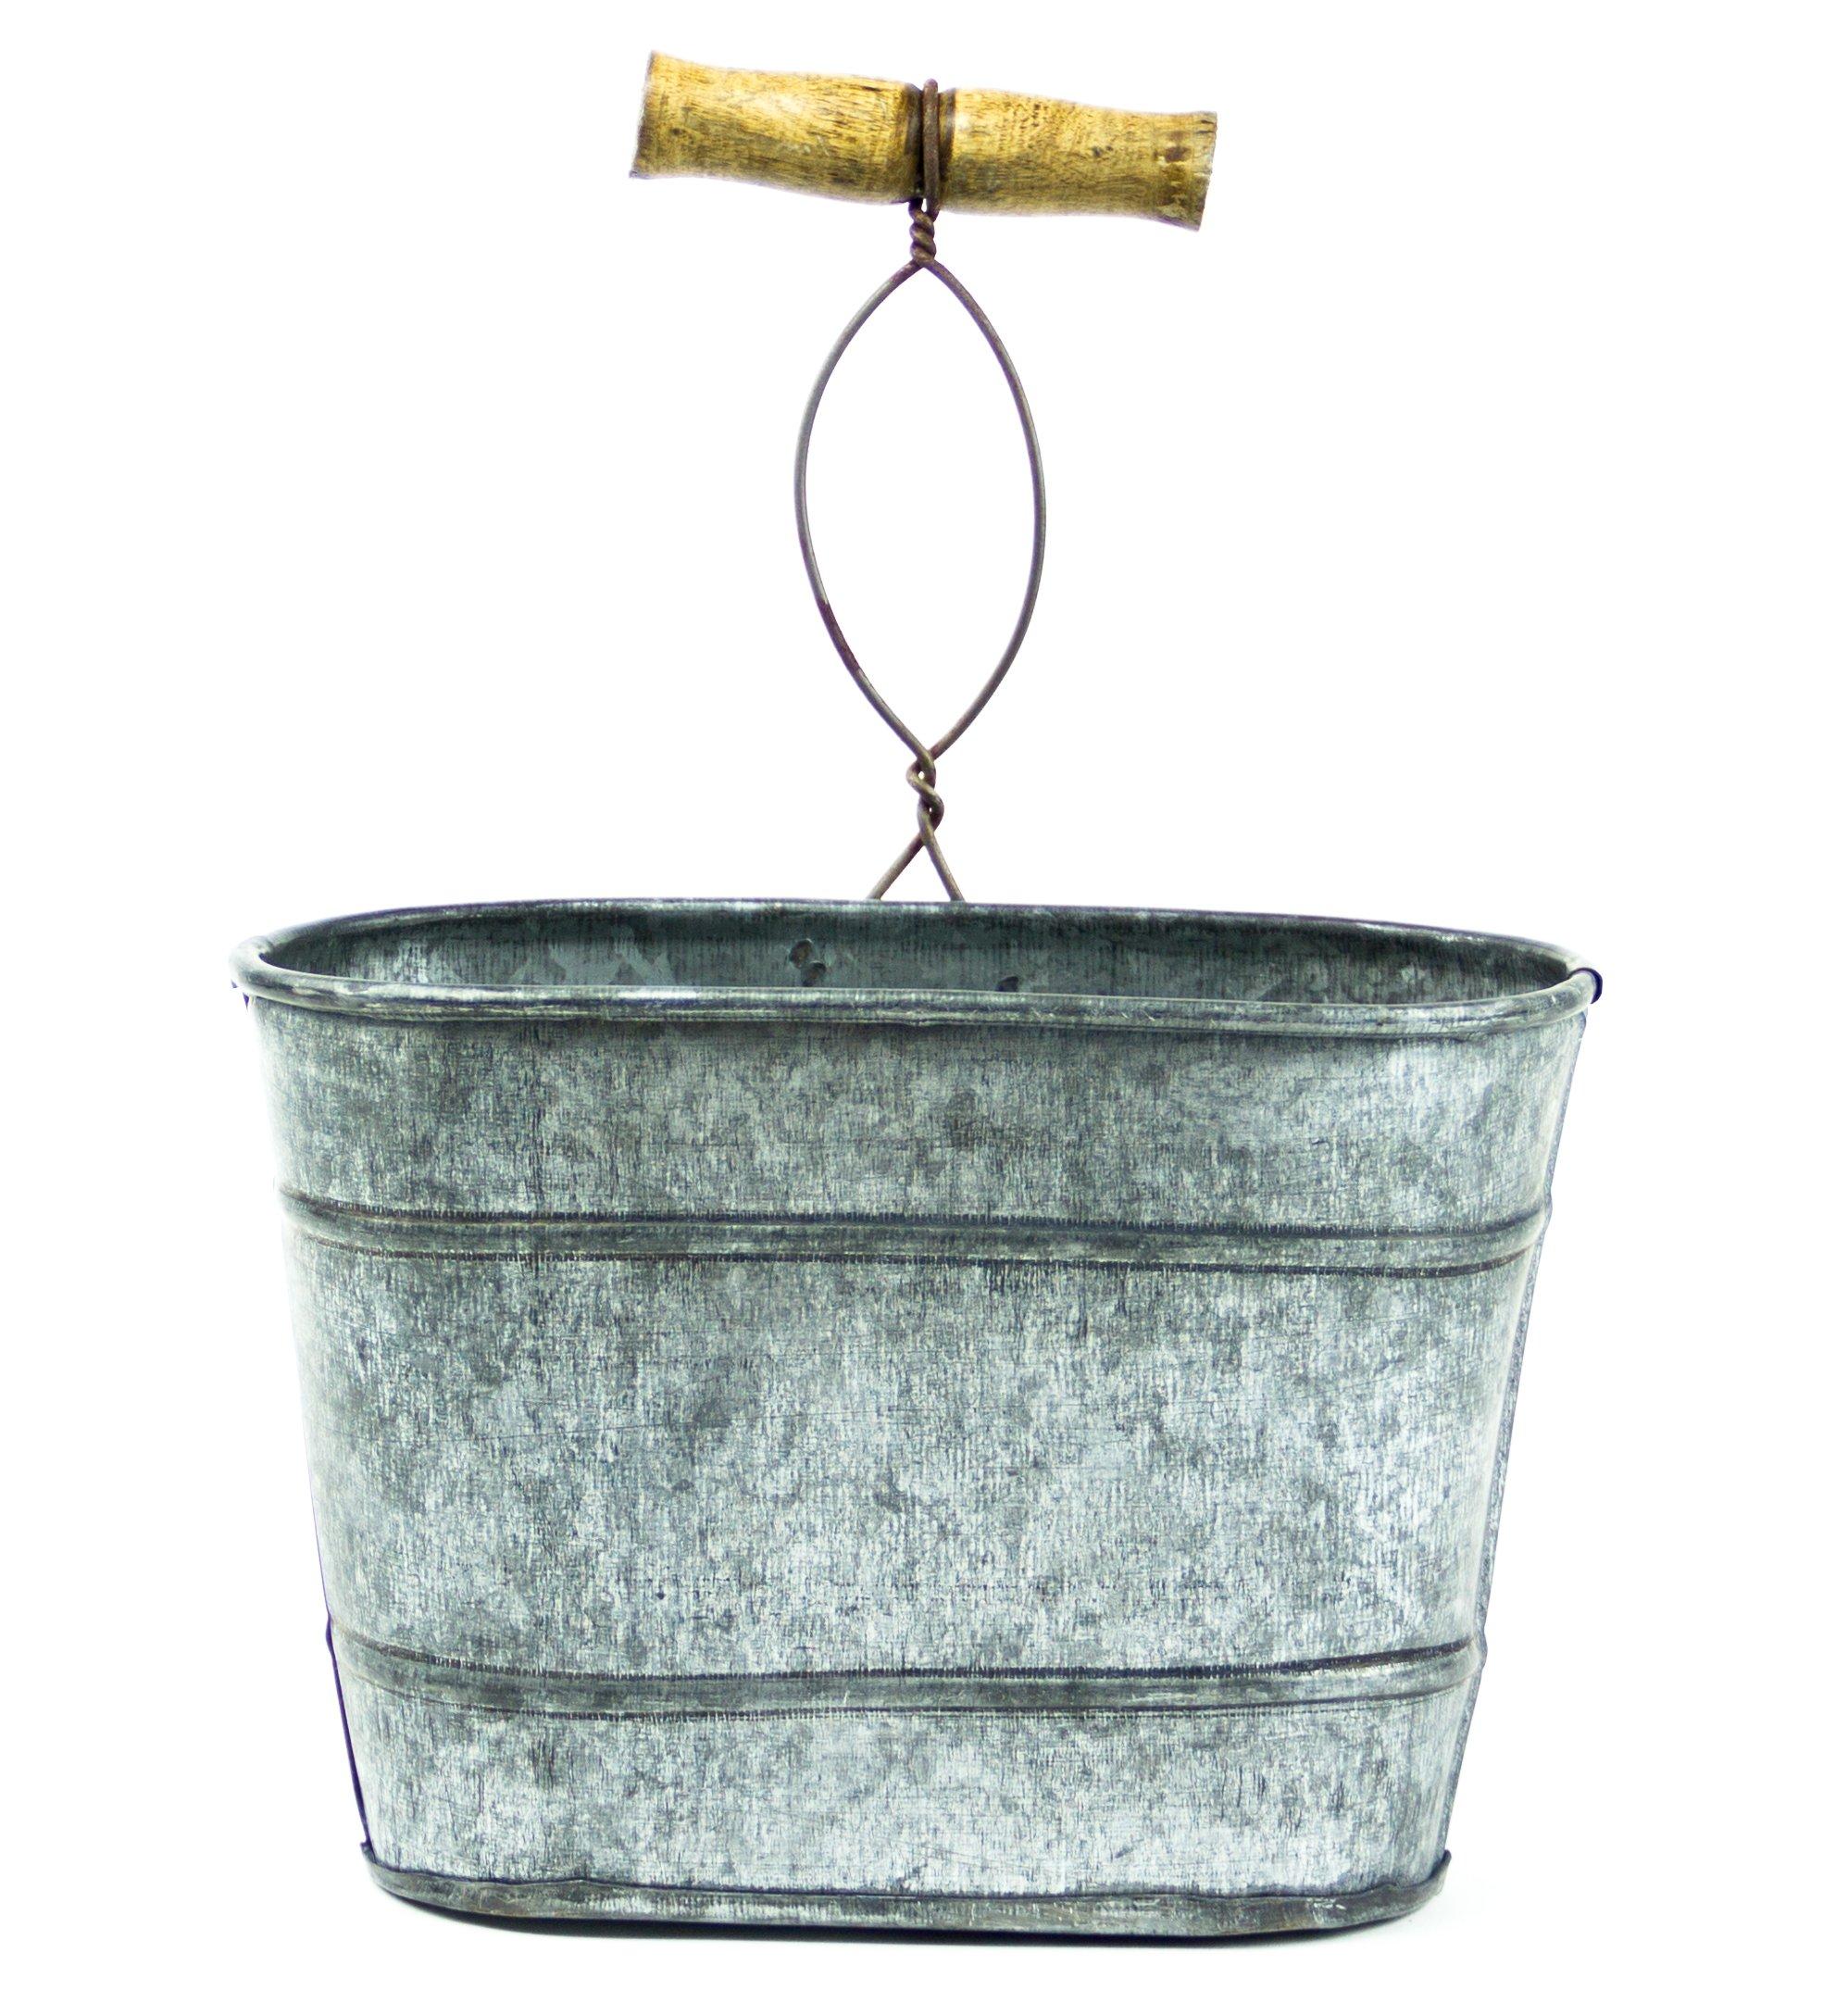 Farmhouse Galvanized Hanging Bucket, Small